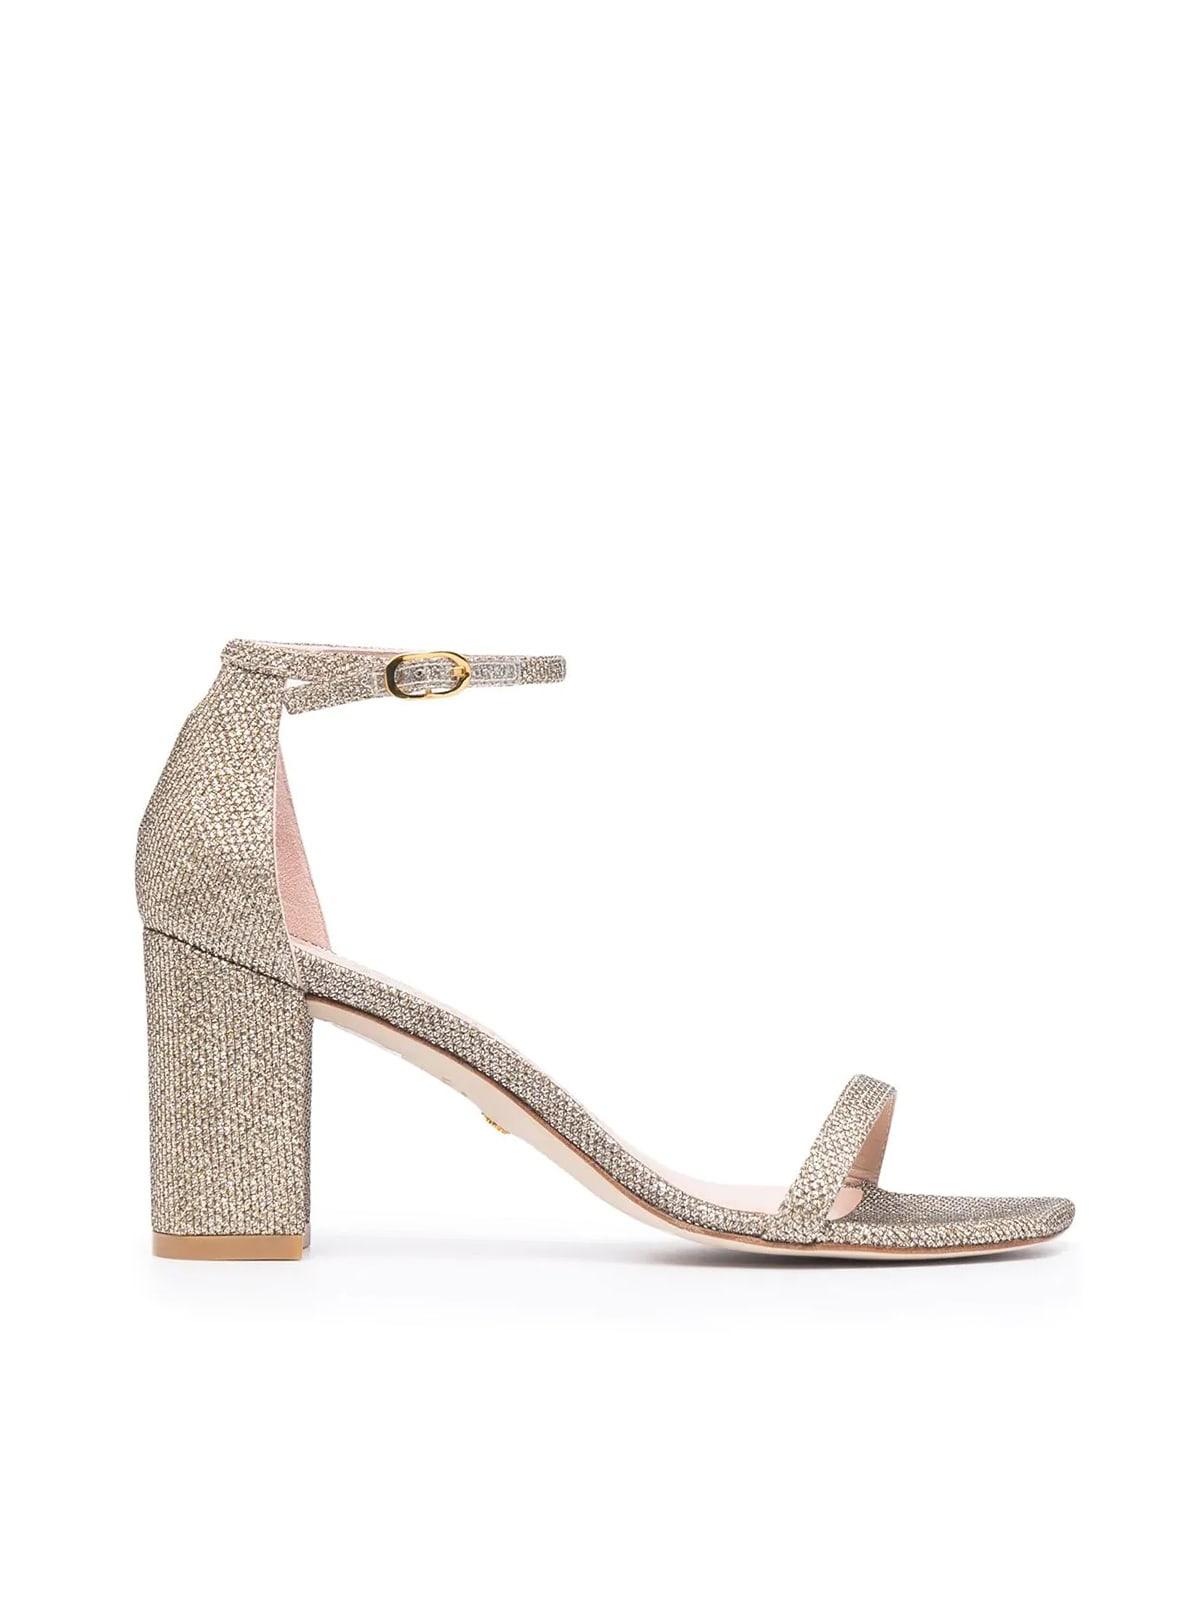 Buy Stuart Weitzman Amelina Block Leo online, shop Stuart Weitzman shoes with free shipping